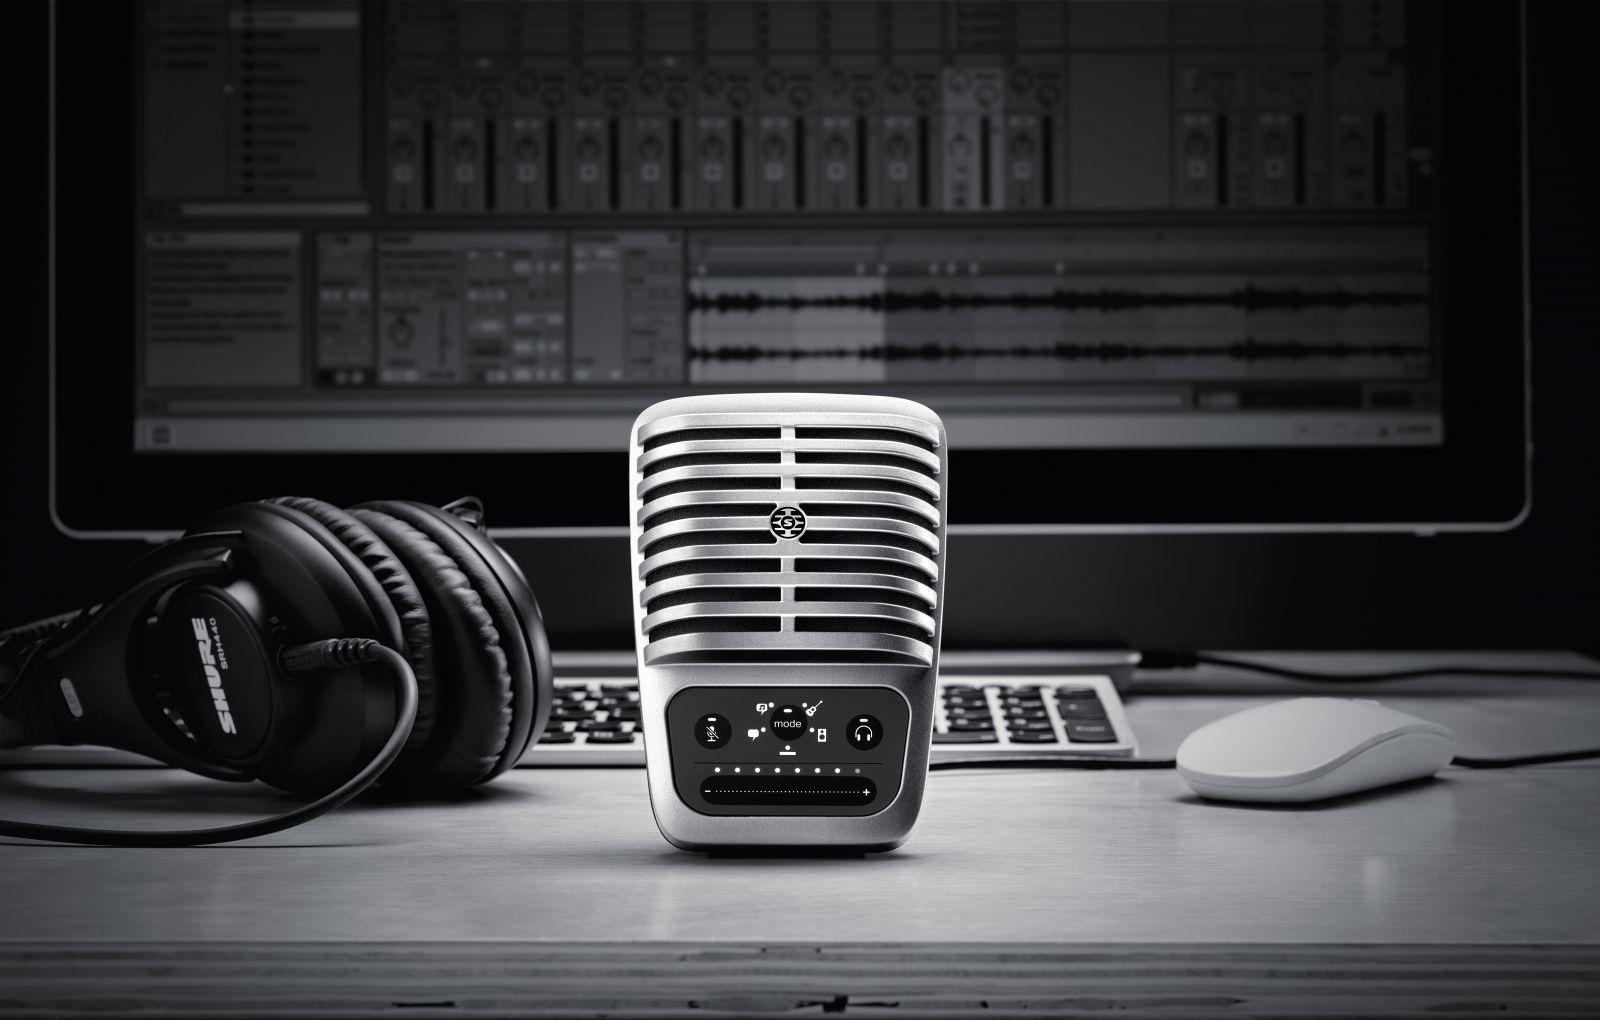 Shure MV51 Podcasting Condenser Mic